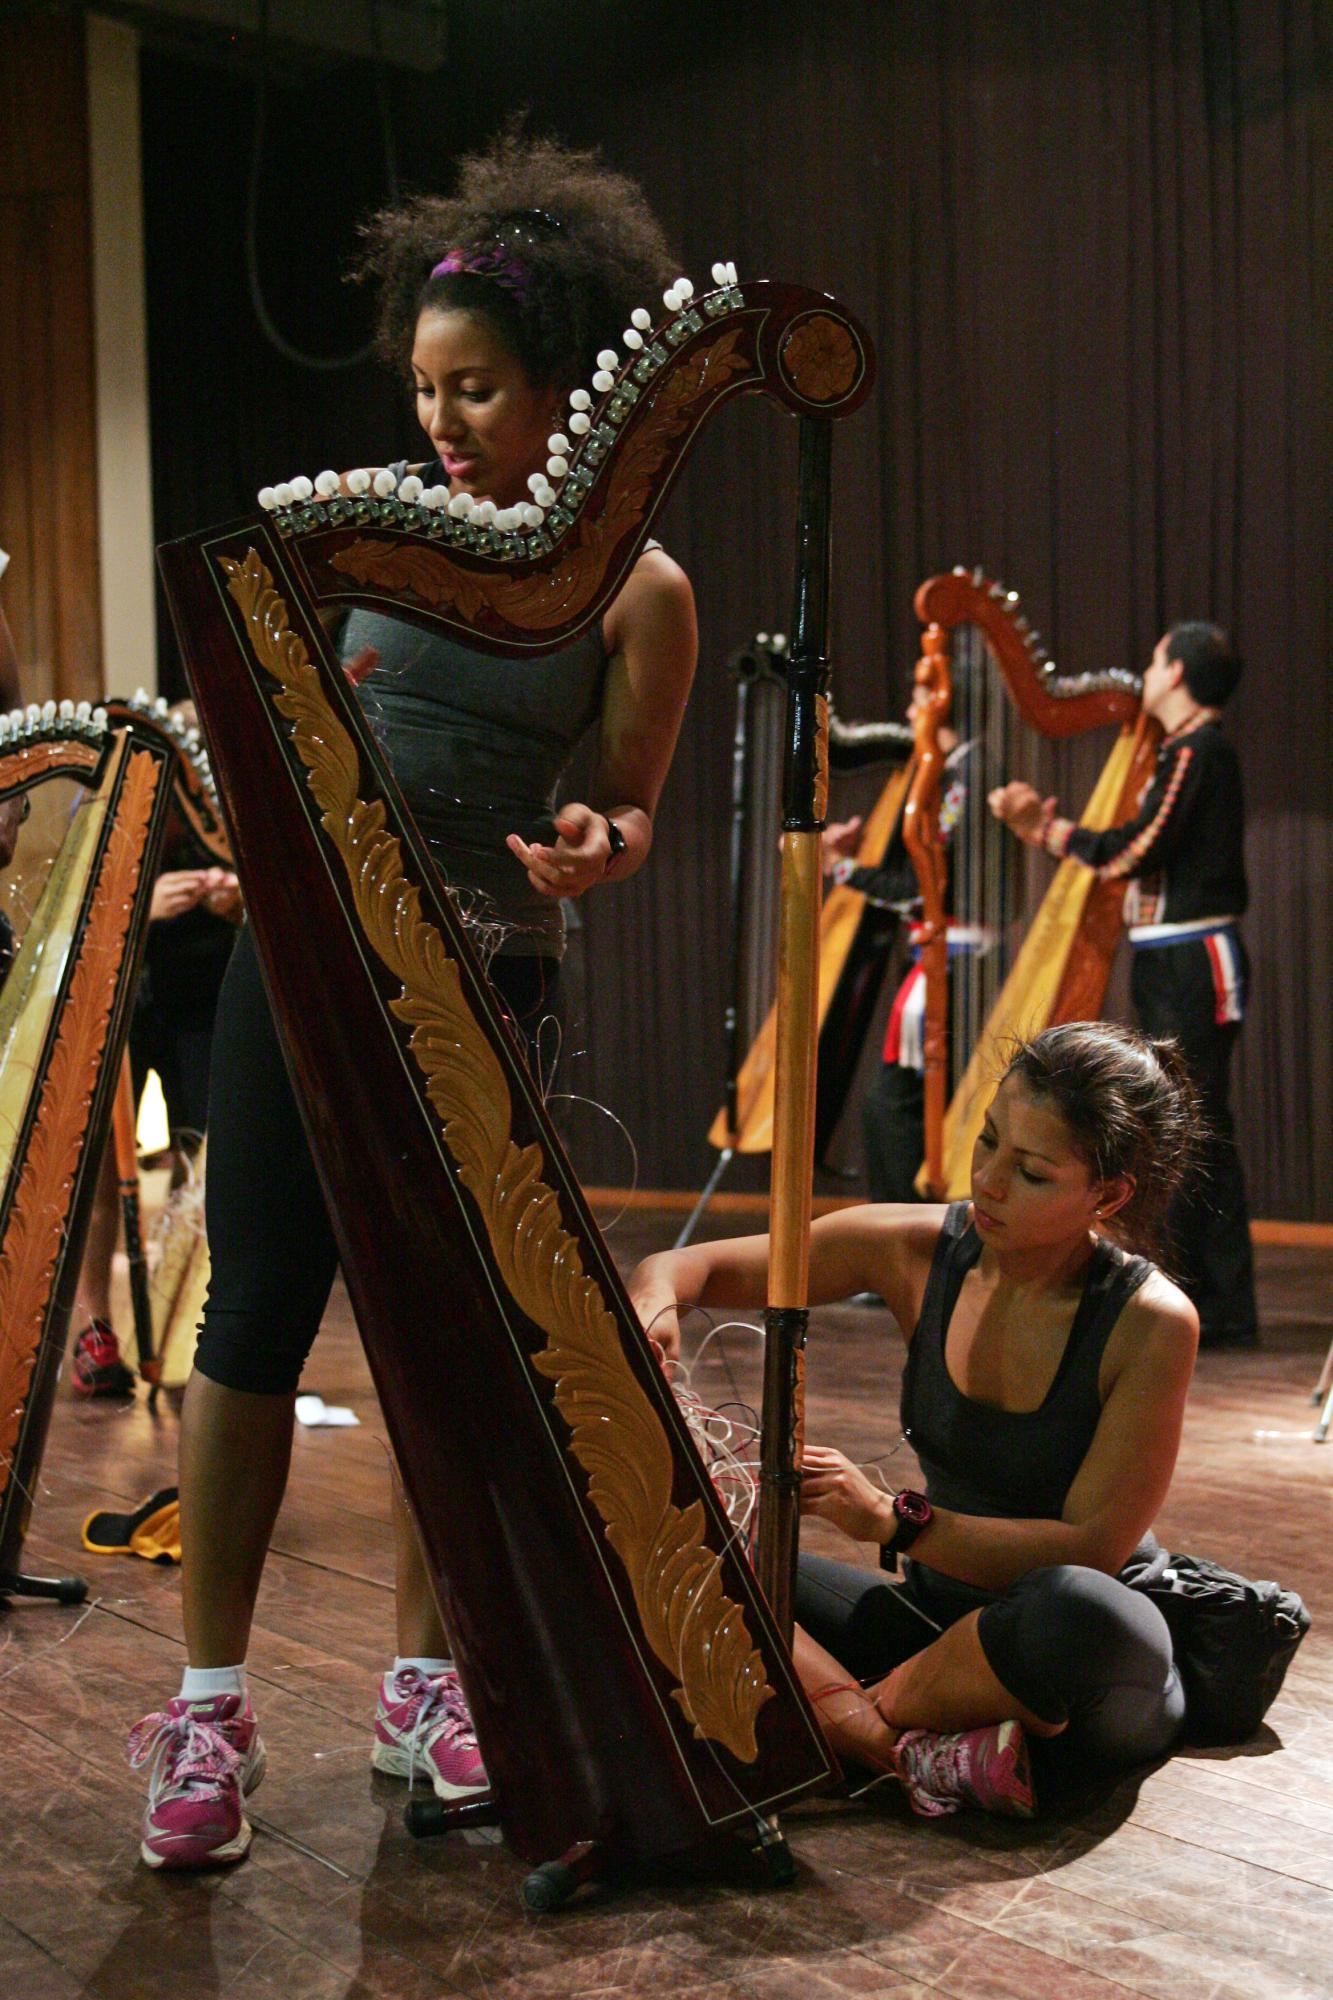 Stringing a Harp